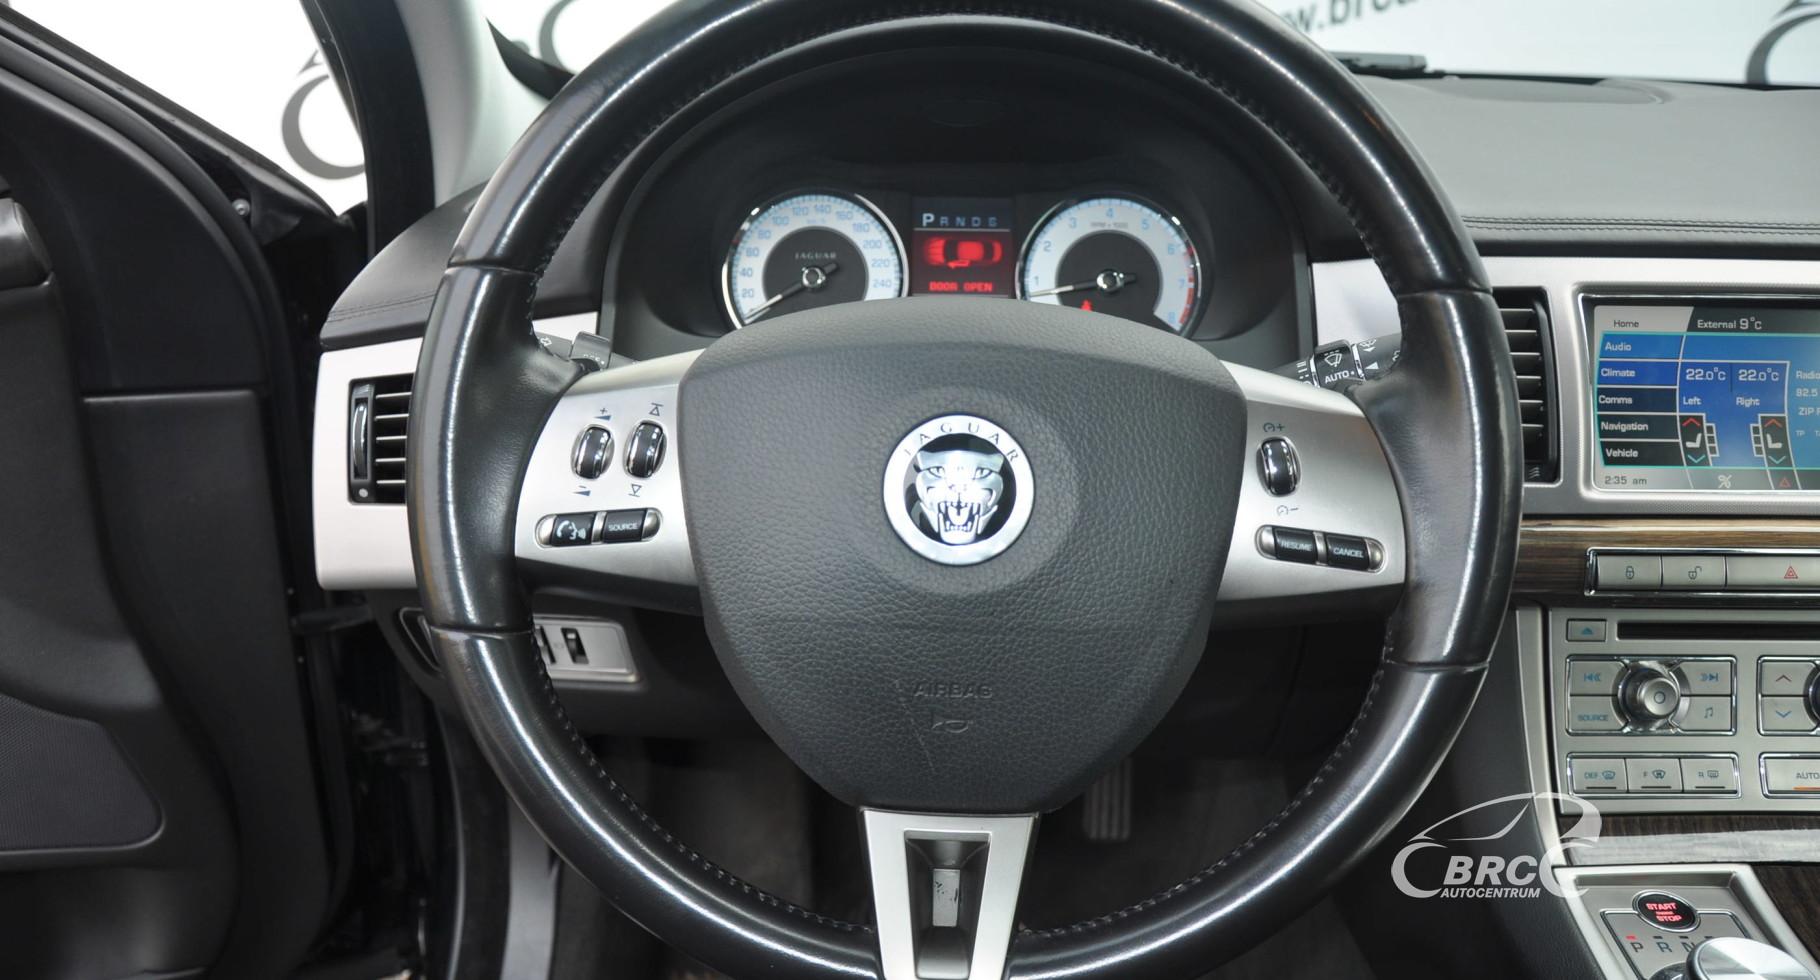 Jaguar XF 4.2 V8 Automatas